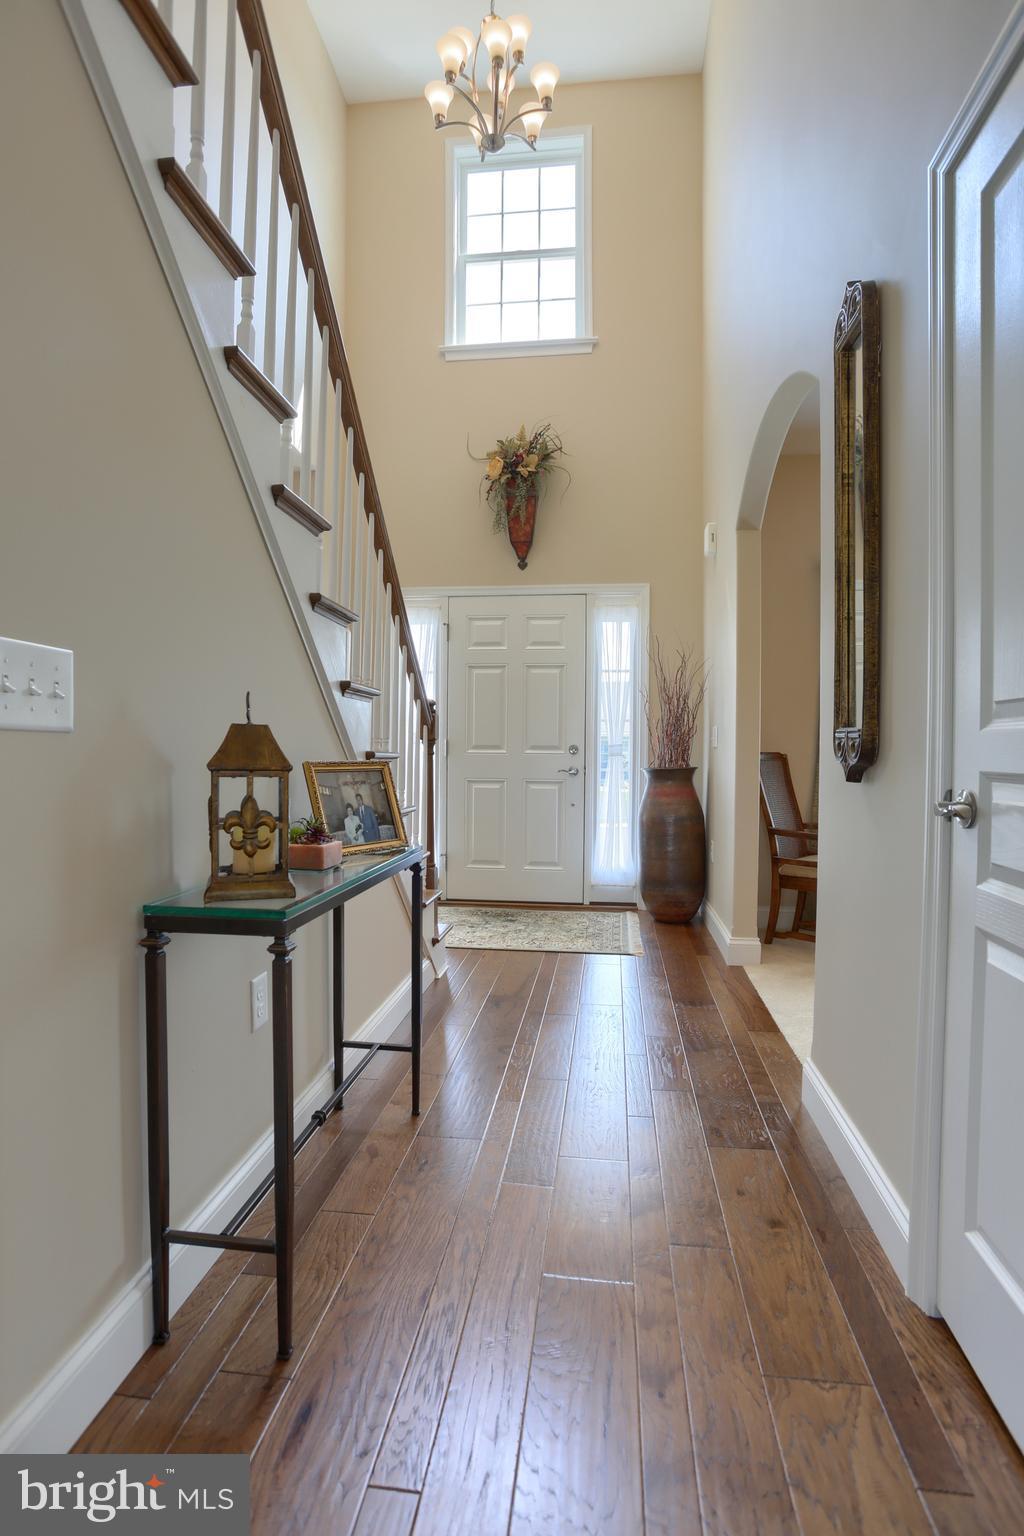 Hallway with hardwood flooring